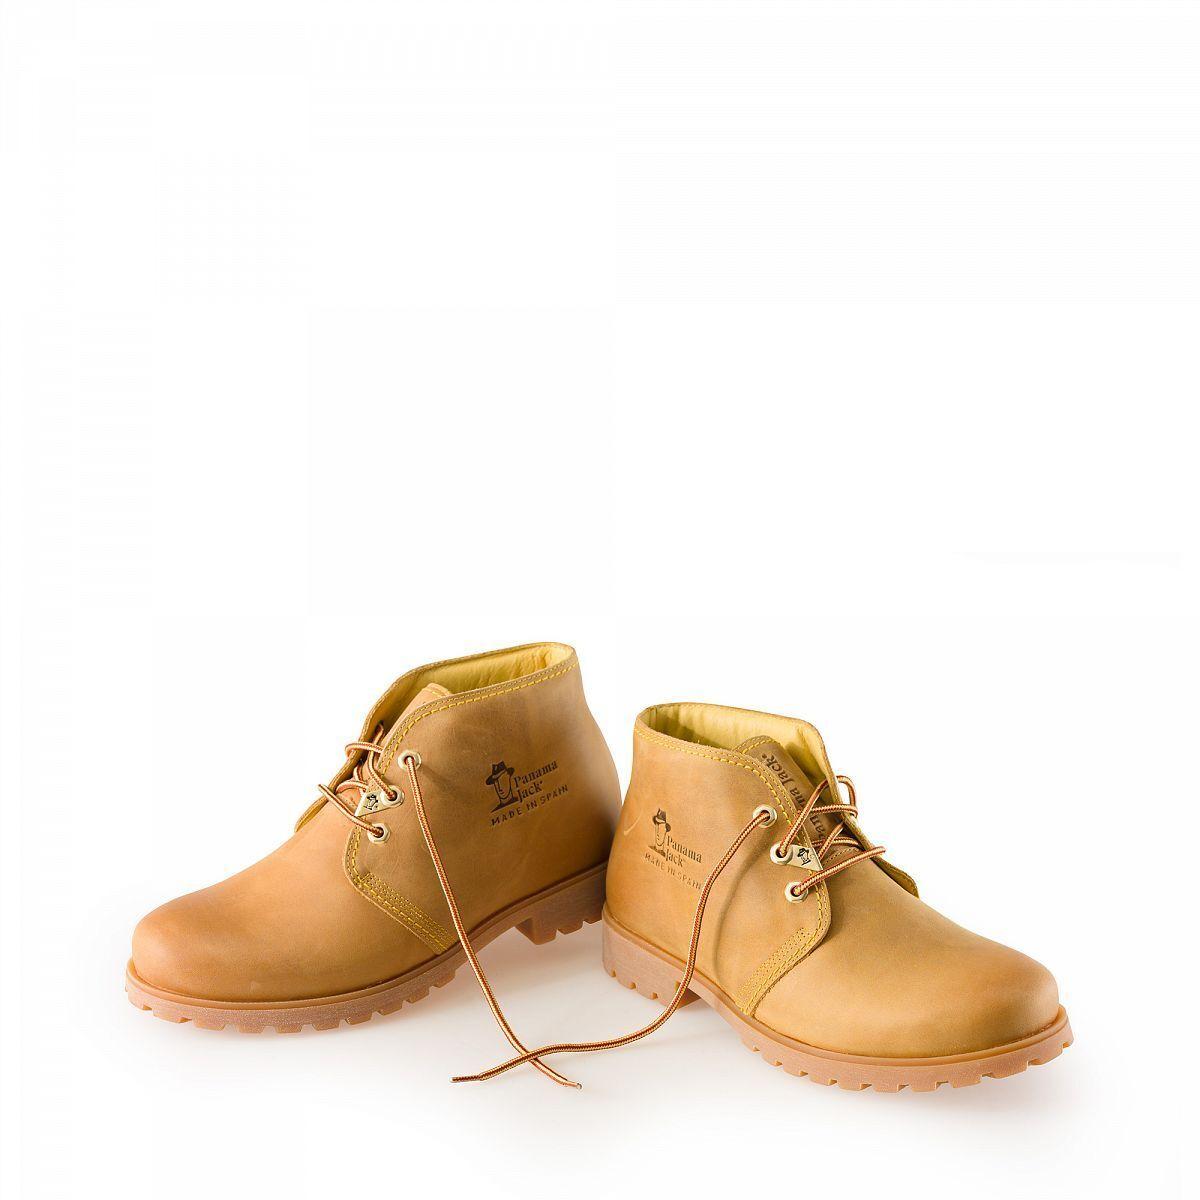 Panama Panama Panama Jack Herrenschuhe Schuhes Stiefeletten Schuhe Vintage Napa d98498